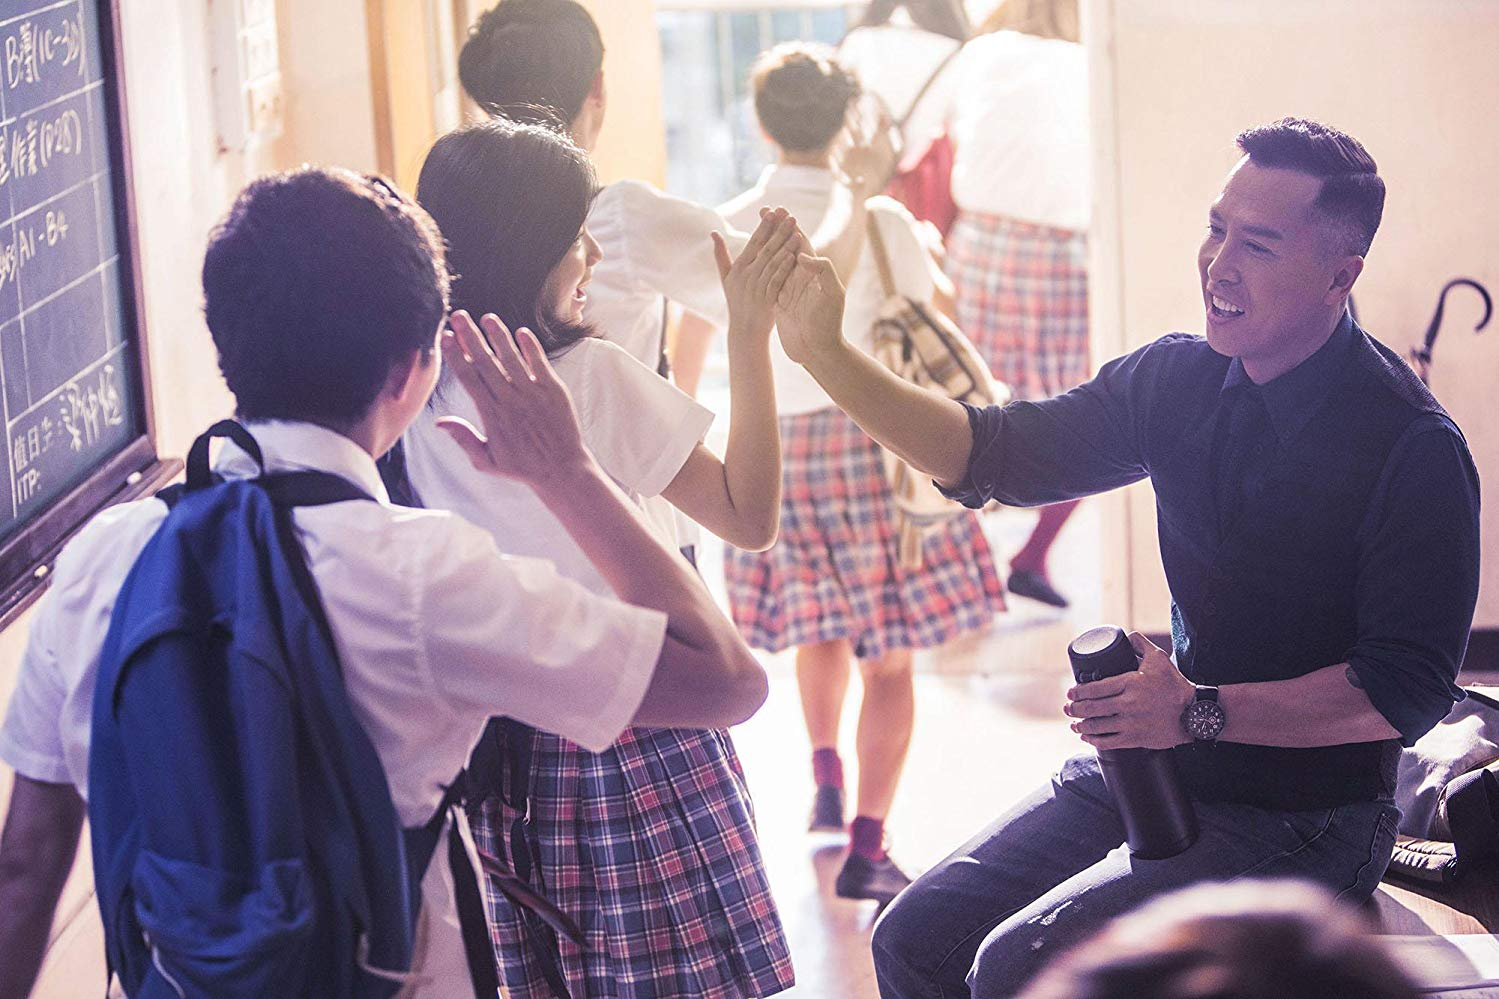 big brother 2018 donnie yen full movie english subtitles